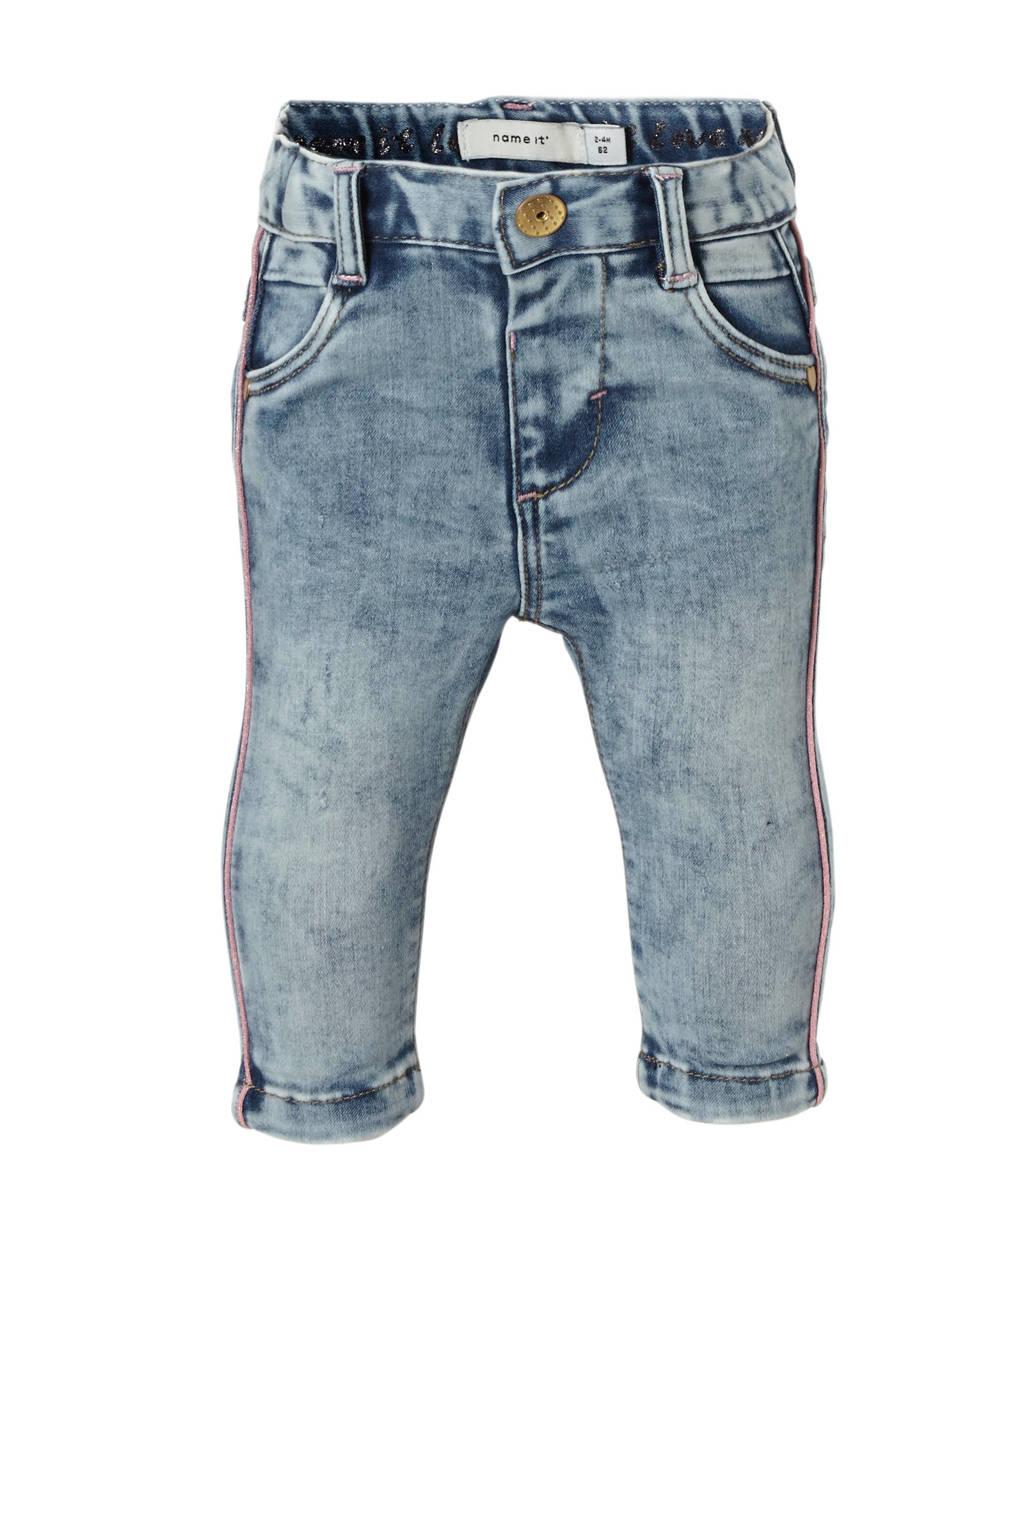 name it BABY baby slim fit jeans Salli, Light denim